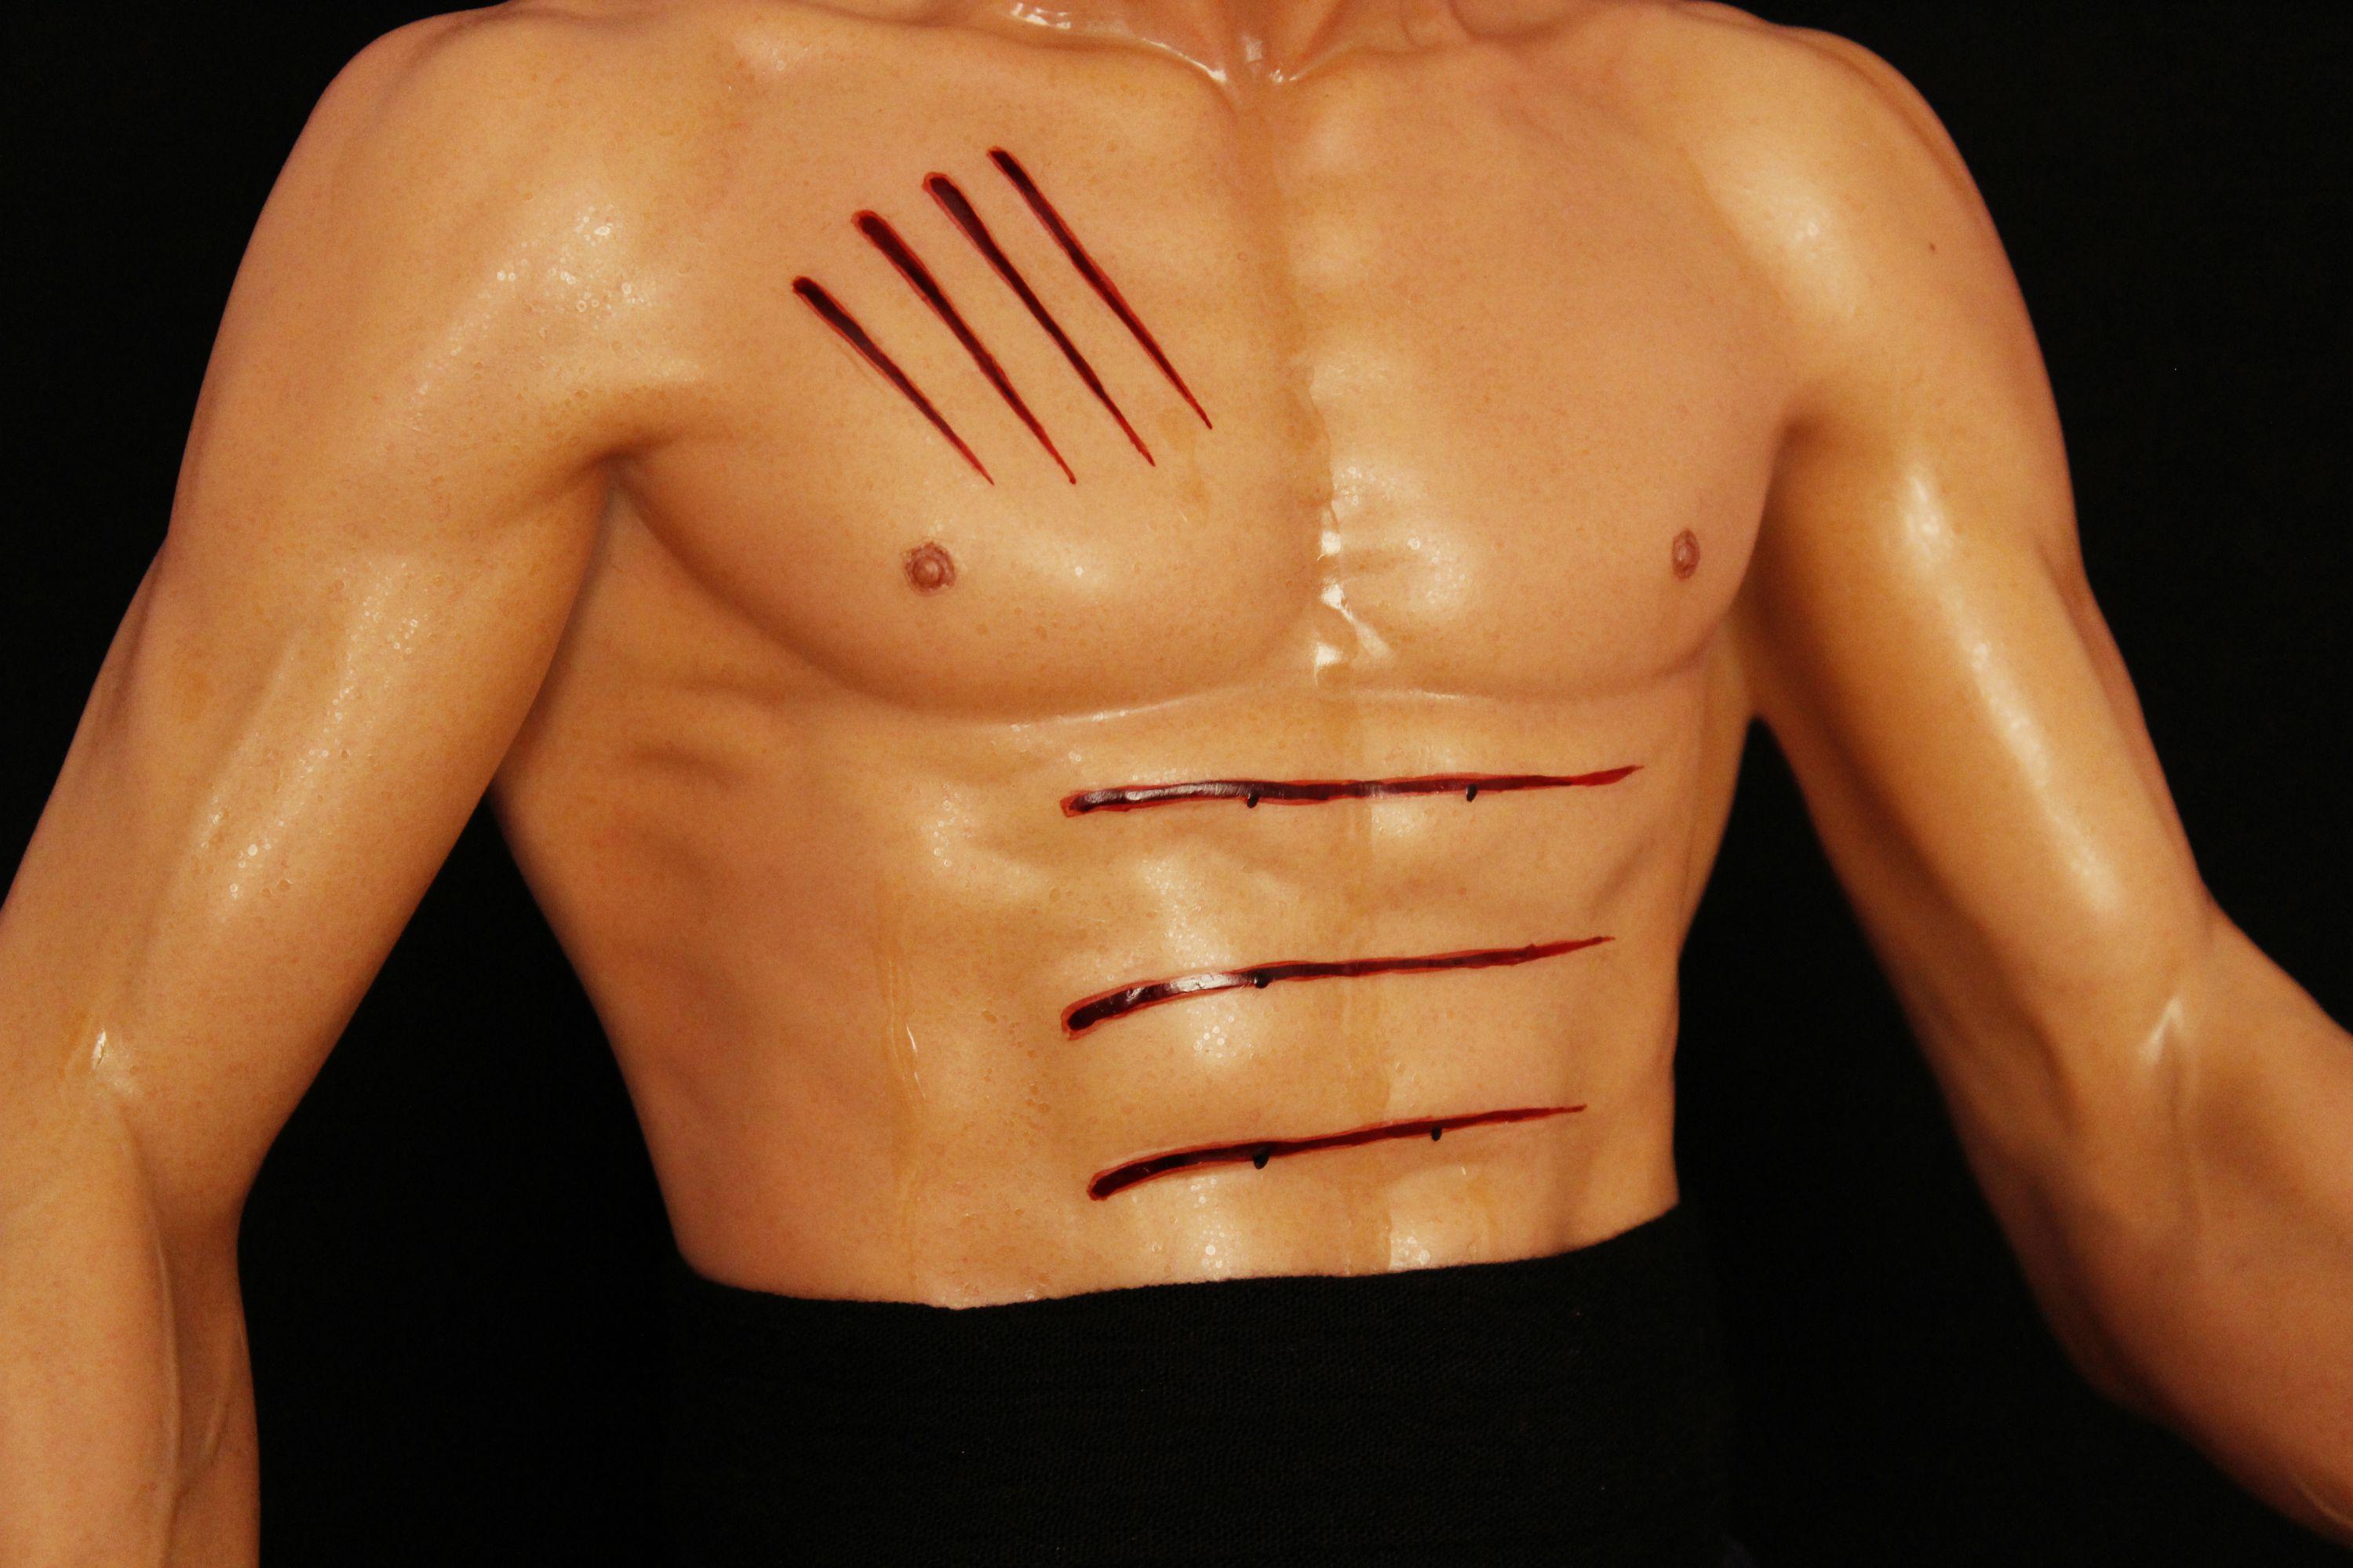 [Blitzway] Bruce Lee Tribute - 1/3 Scale - LANÇADO!!! - Página 6 211413f5xaavbaxvq5a6l0